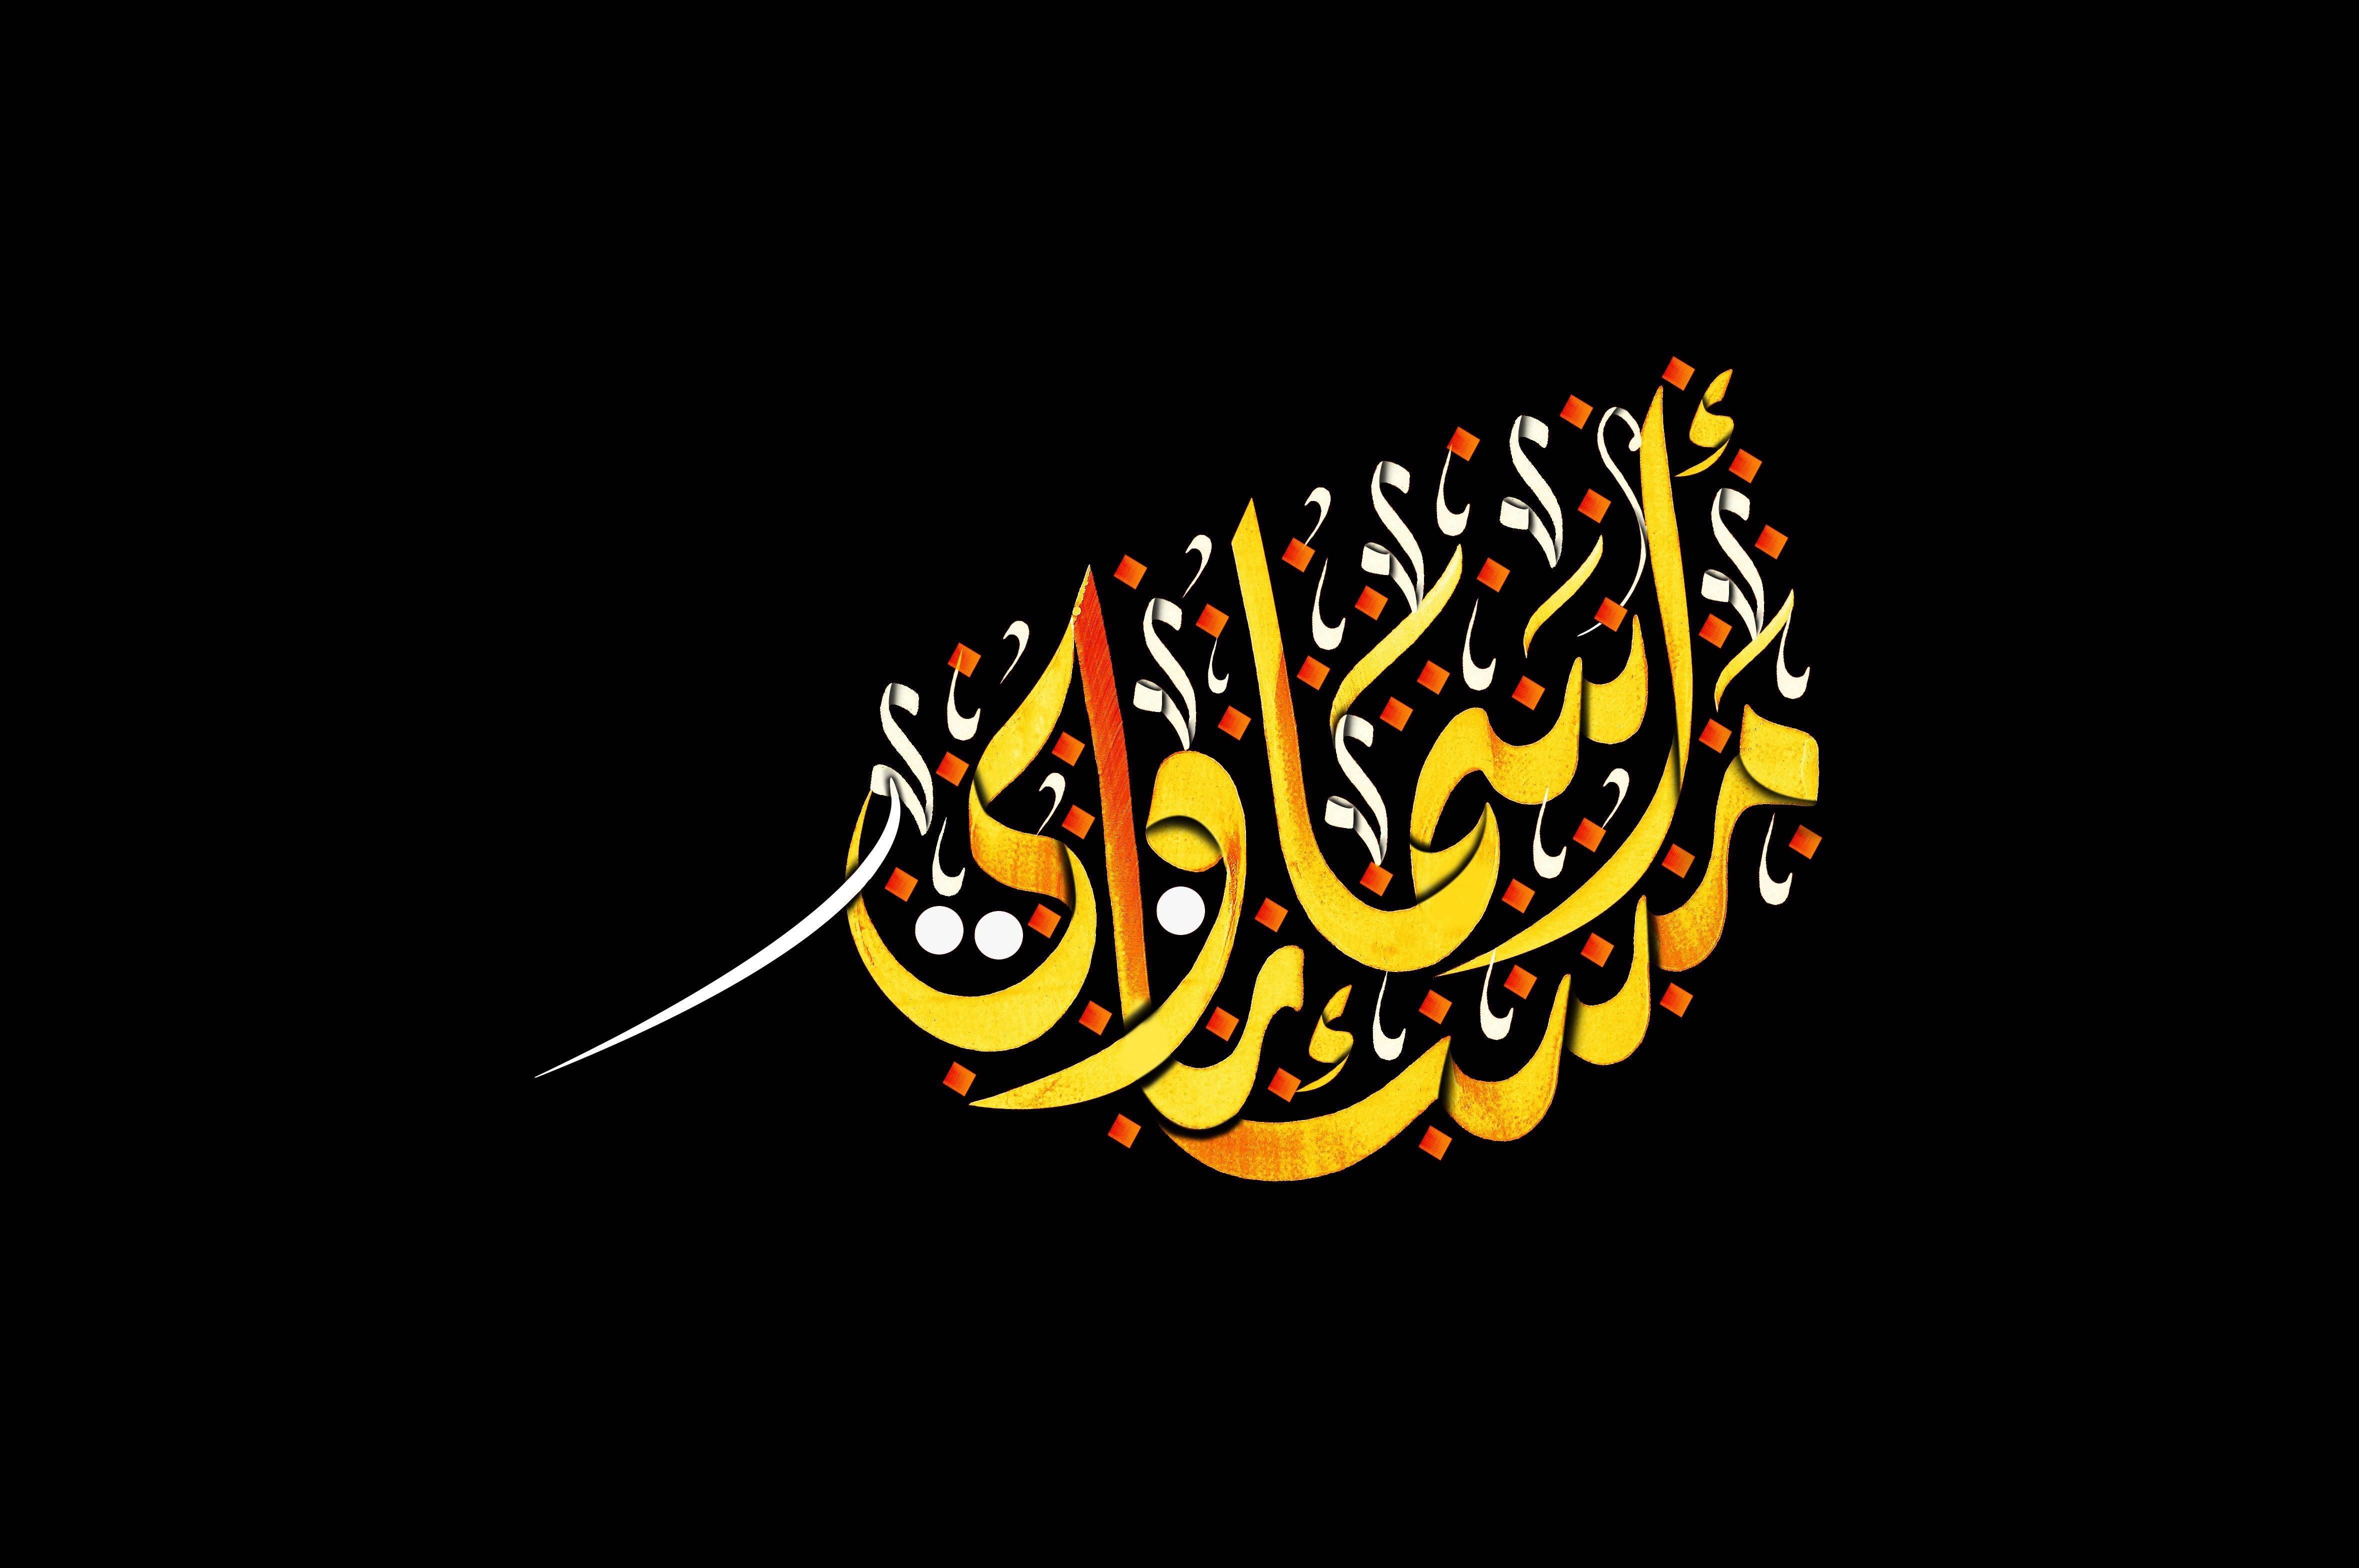 Asma a masnawi arabic calligraphy art by afanahafanah